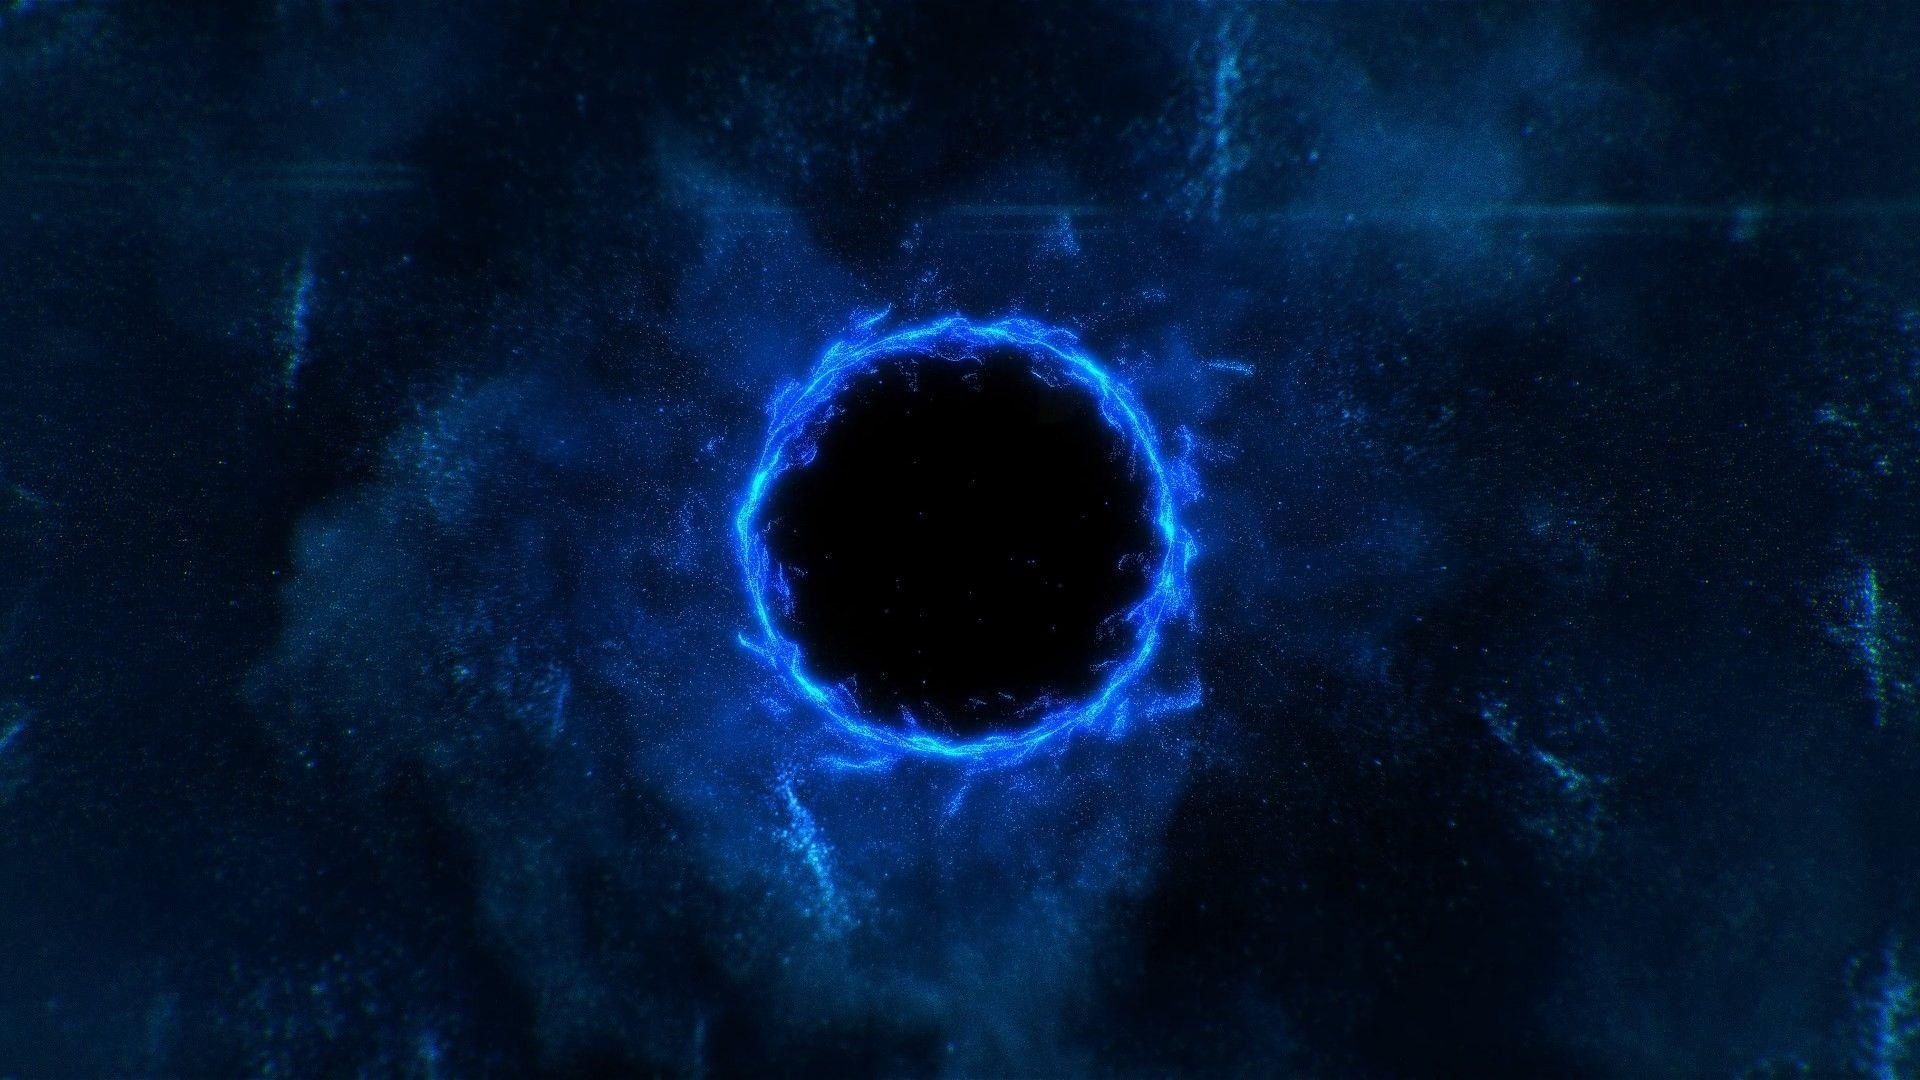 Black Hole, Full HD Wallpaper